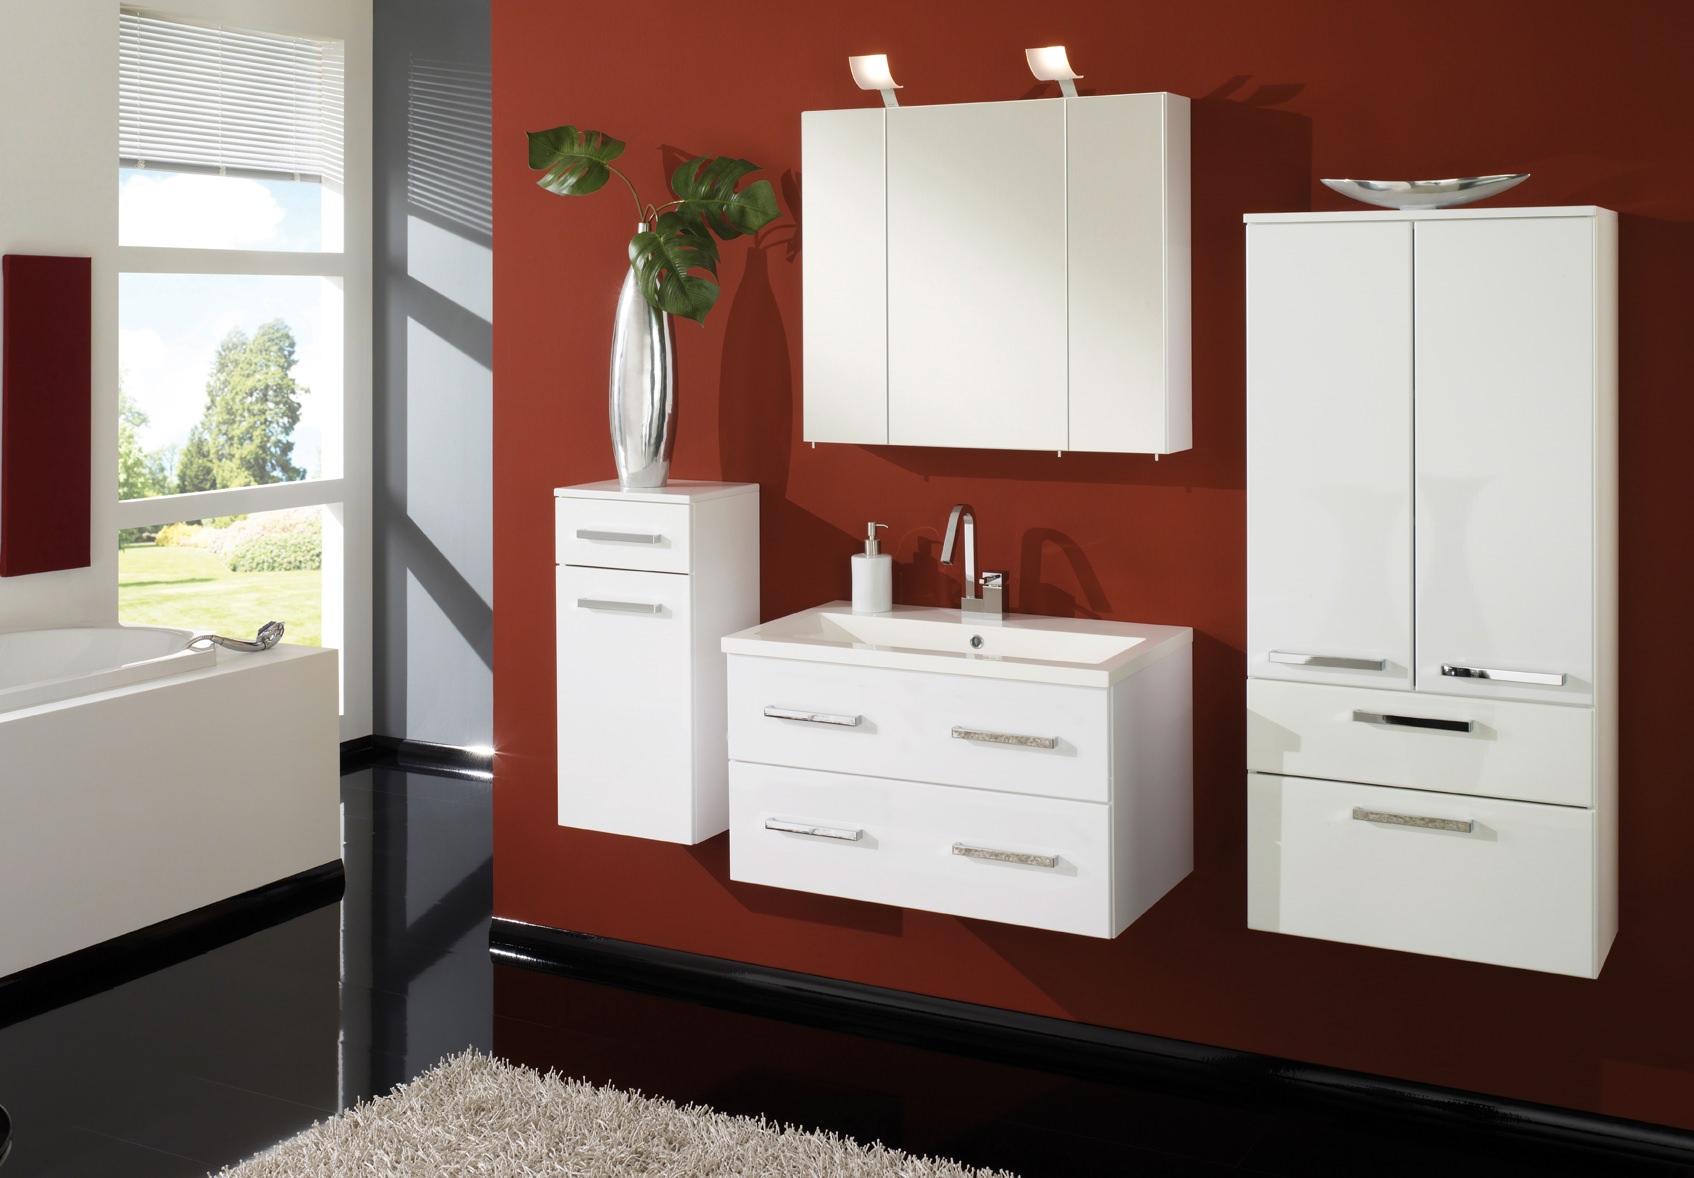 e zoll simply rialto waschplatz 80cm wbu wei wei 10200. Black Bedroom Furniture Sets. Home Design Ideas